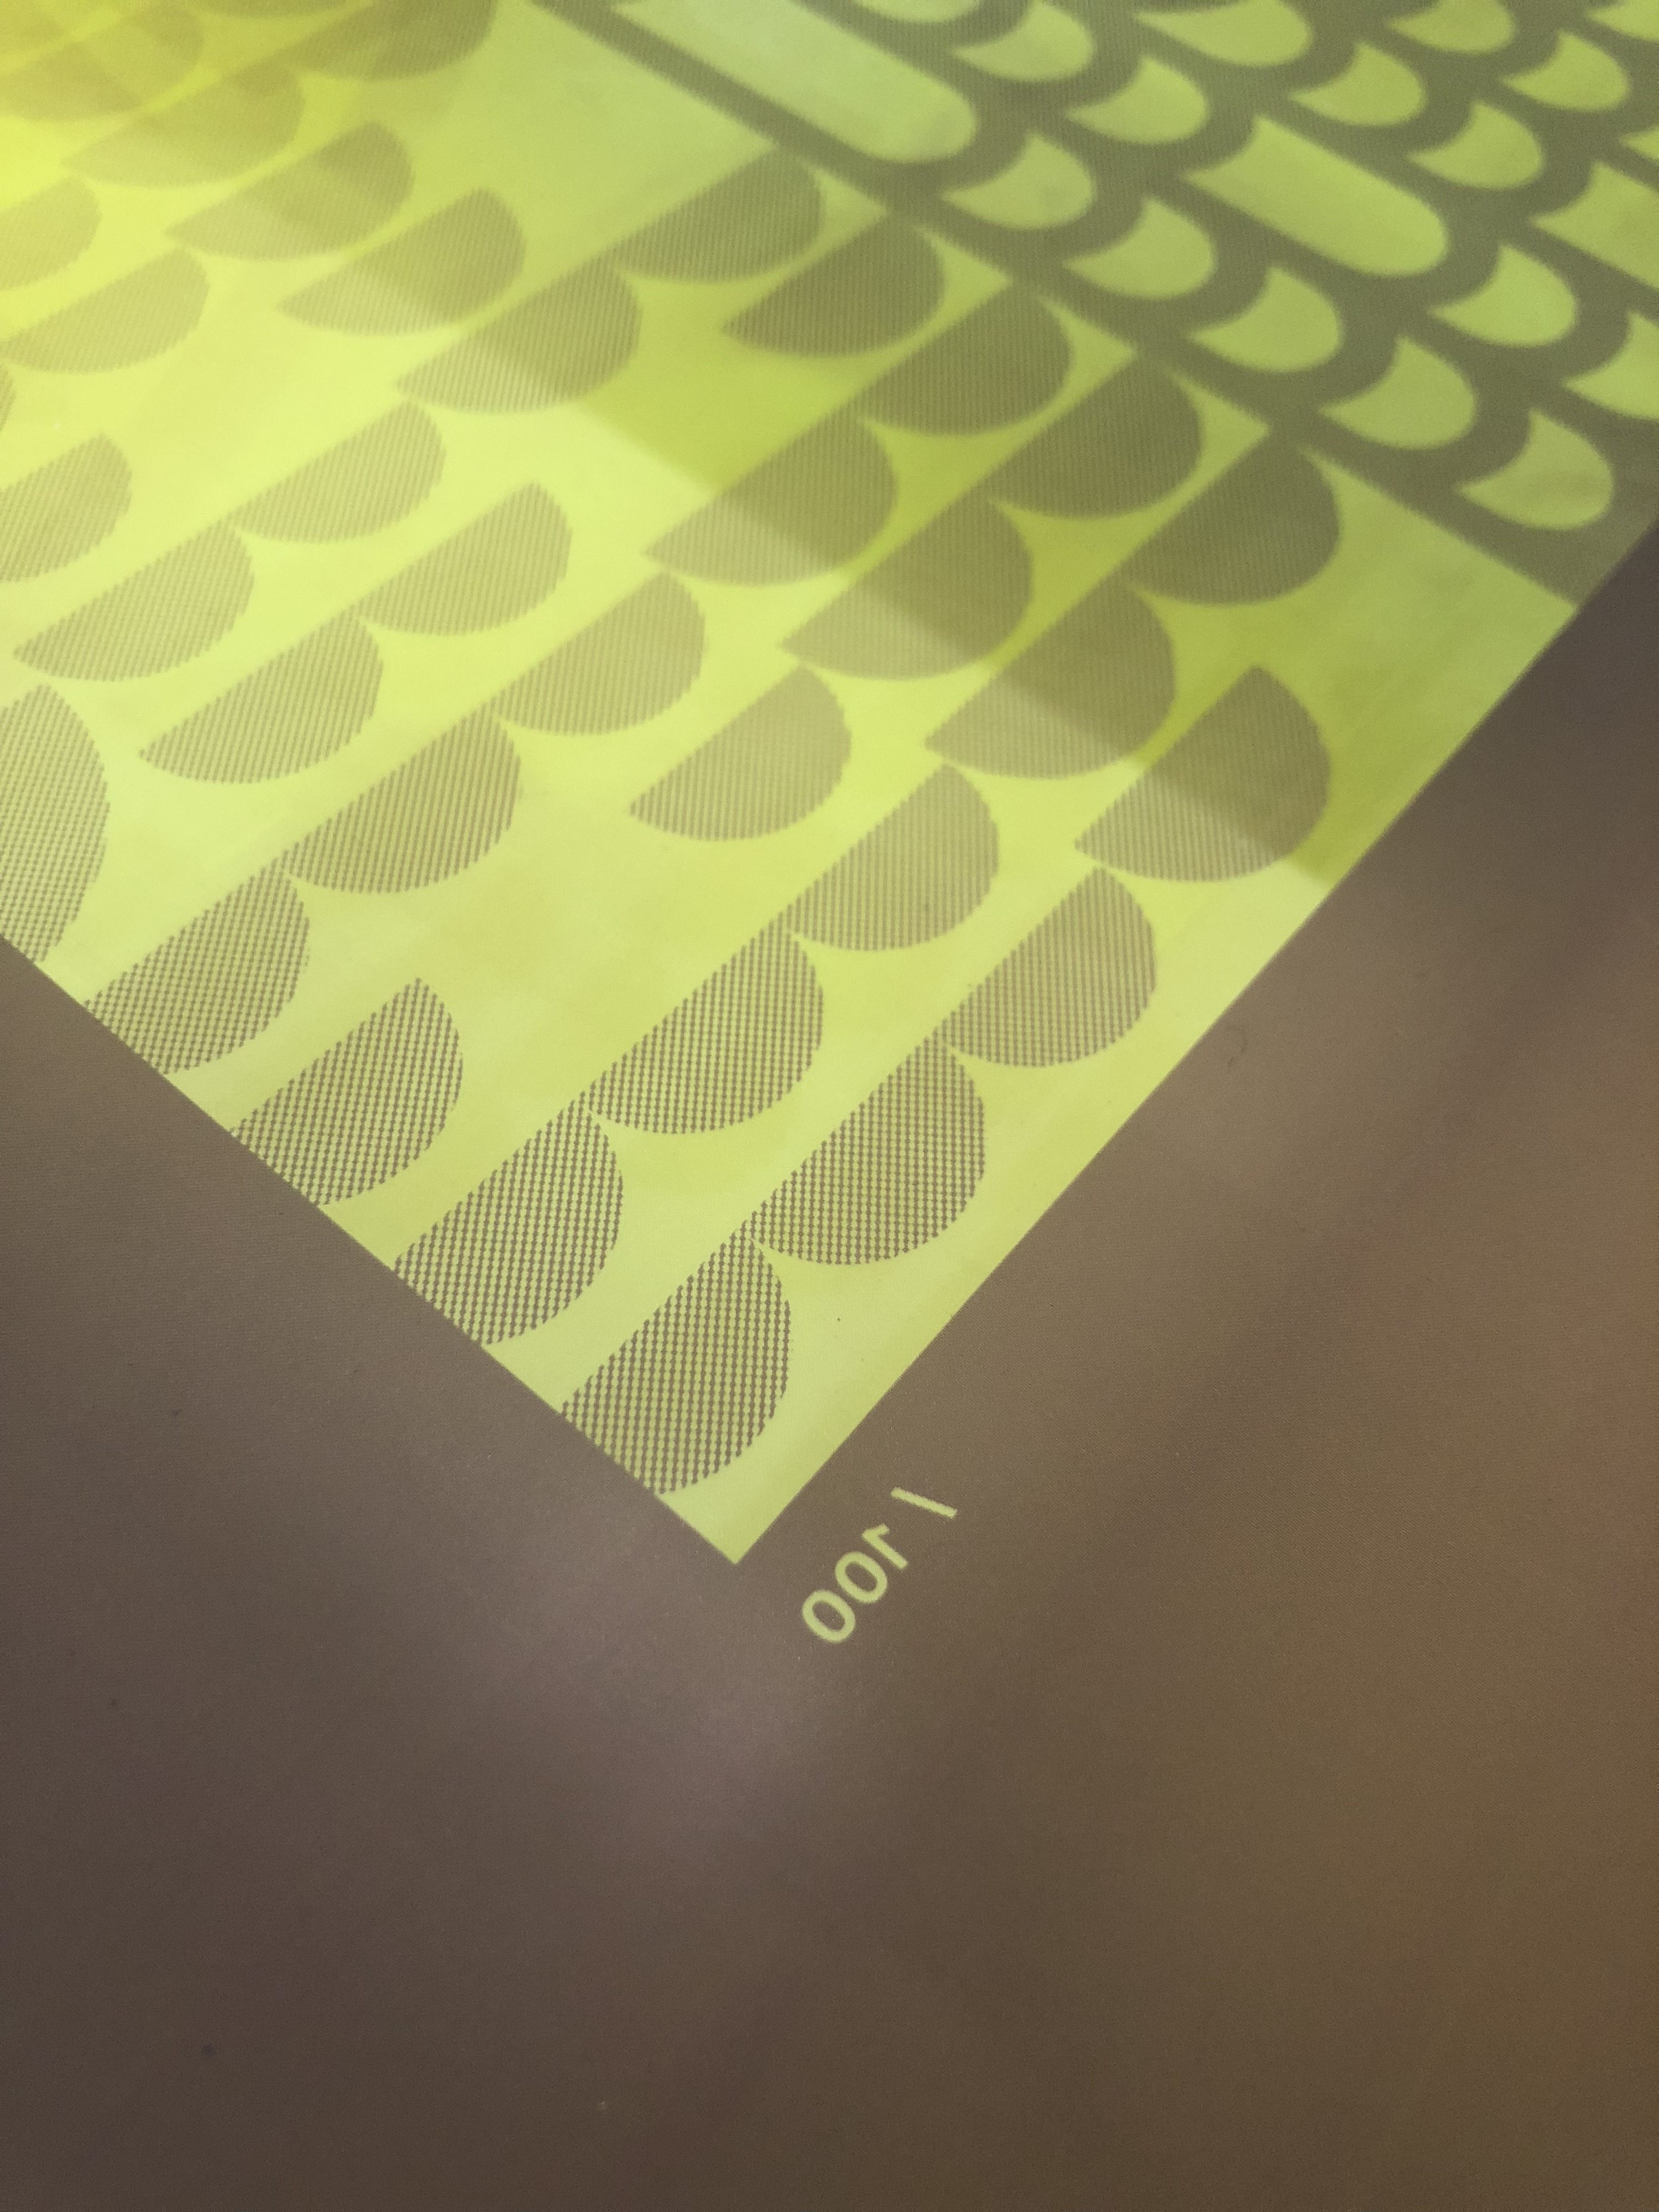 serigraphie-en-serie-limitee-et-signee-epreuve-artiste-fwells